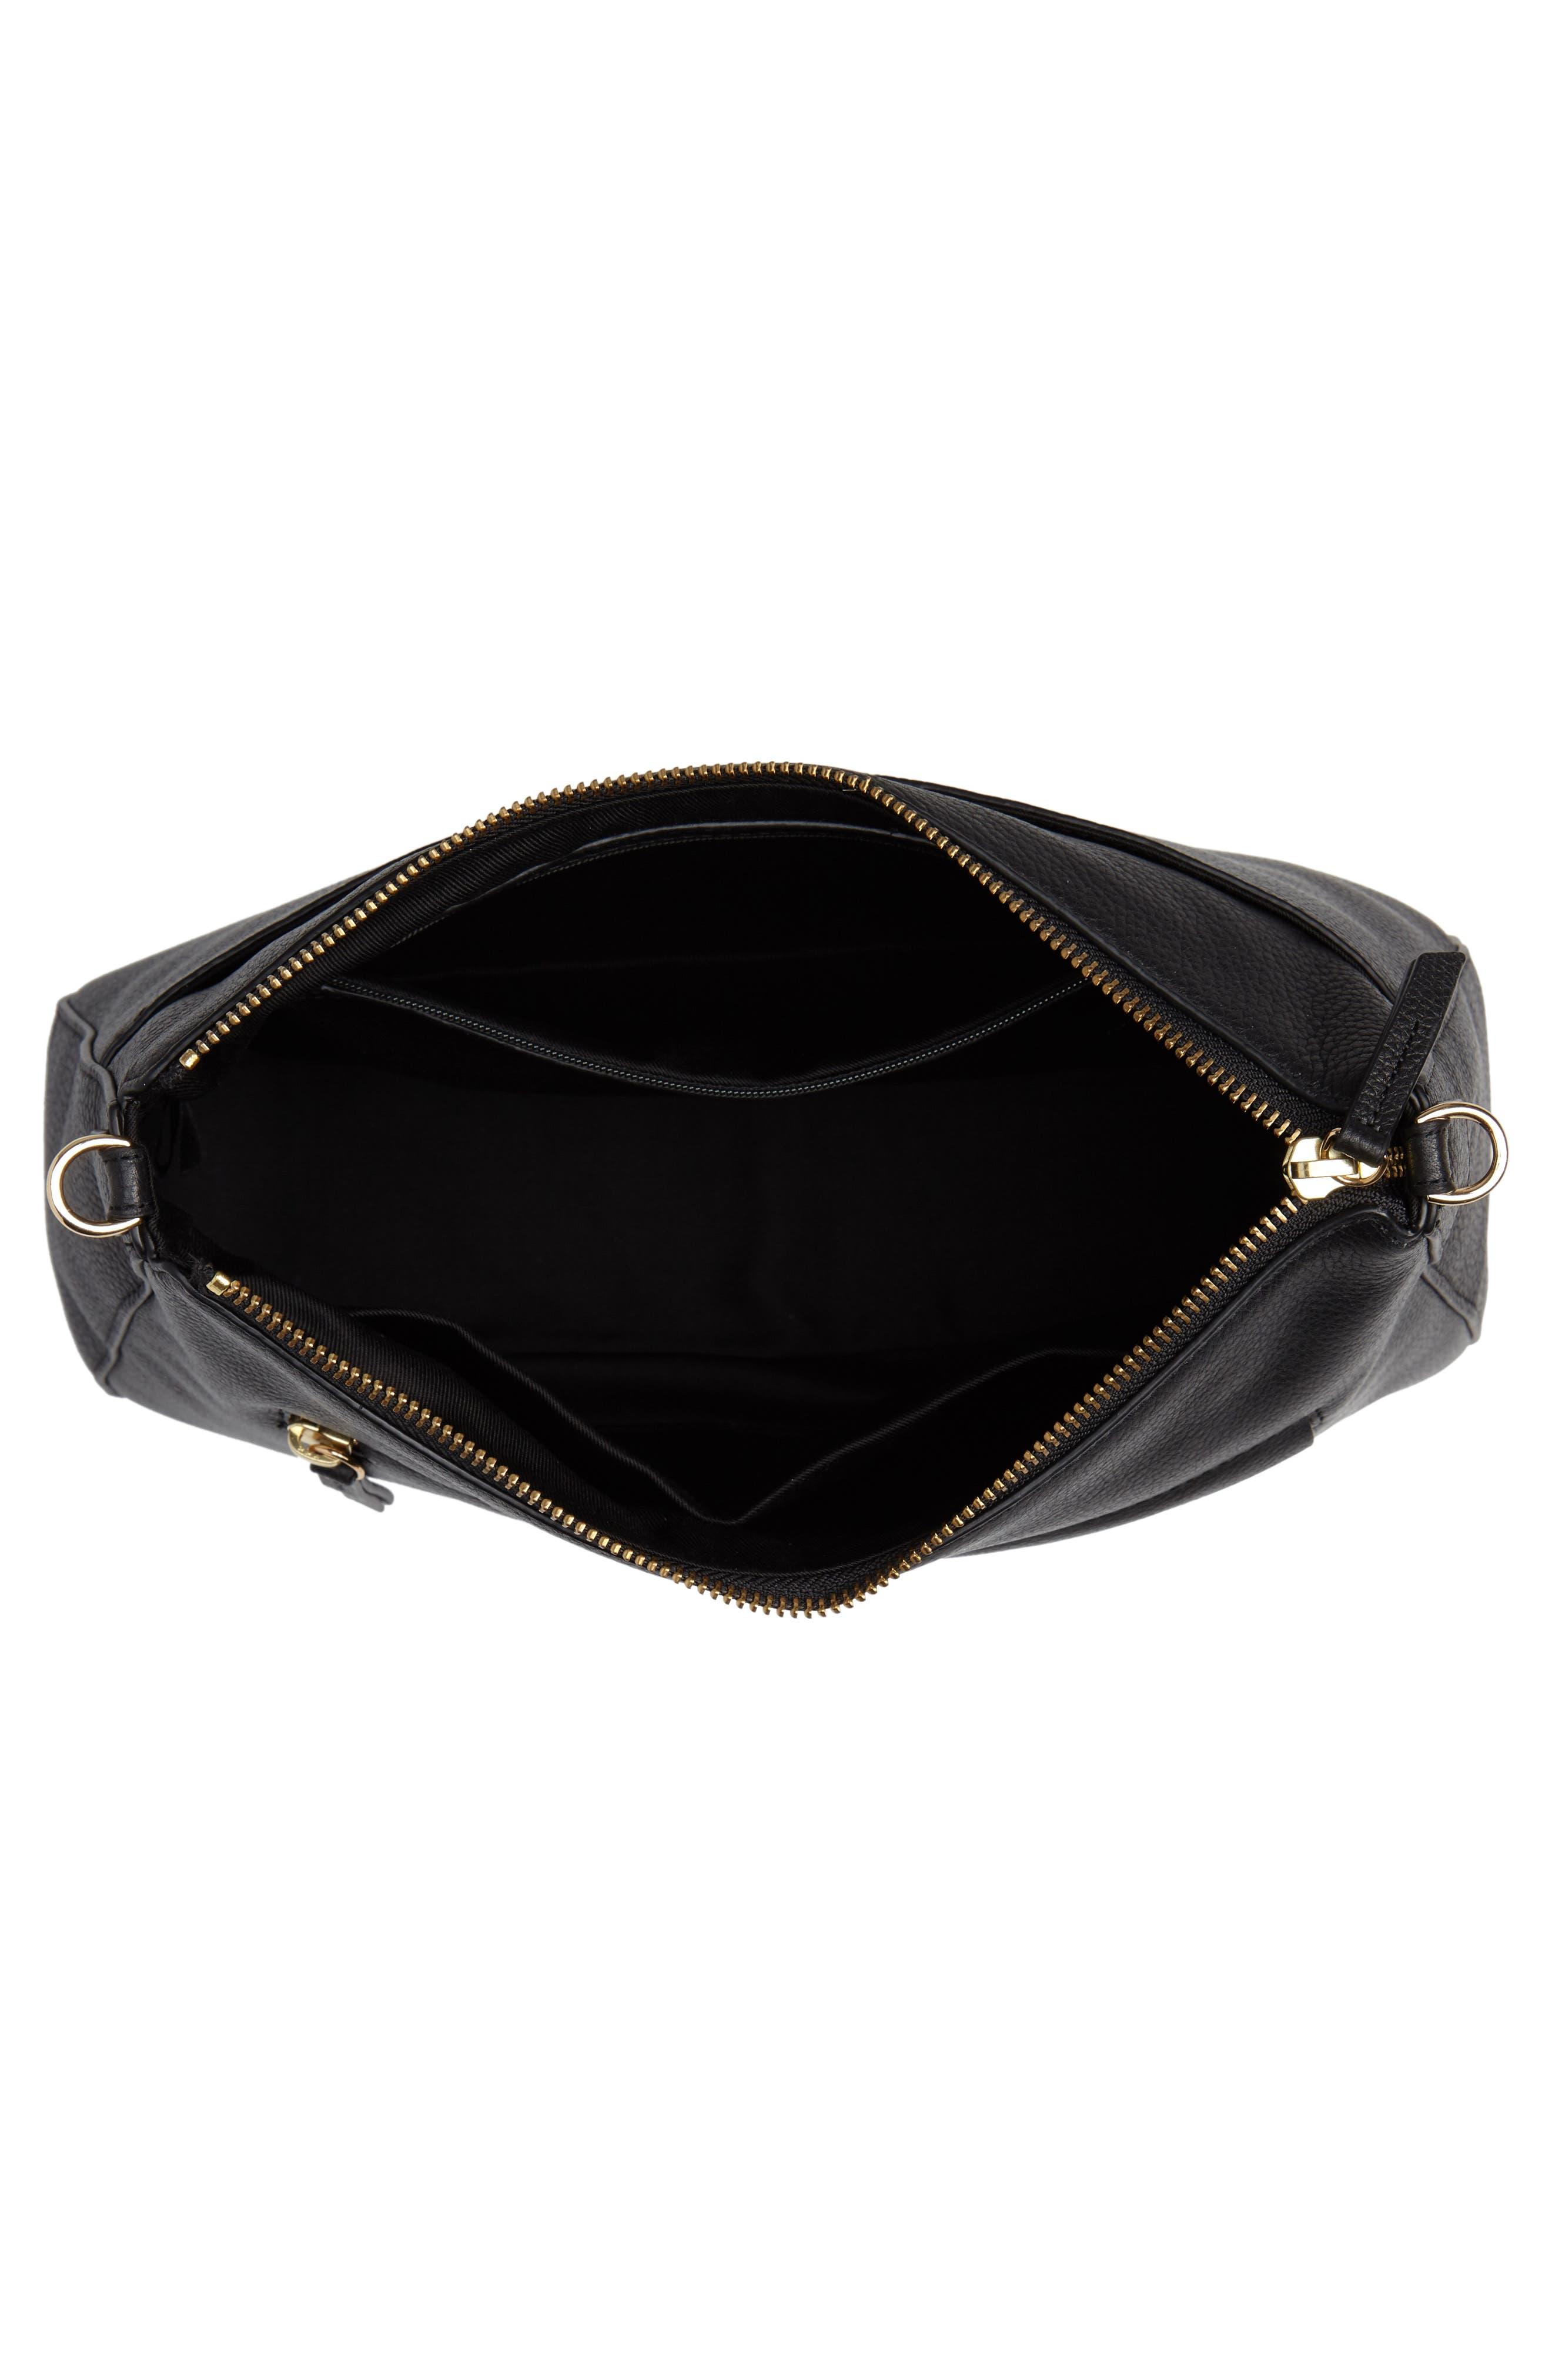 Finn Convertible Leather Hobo,                             Alternate thumbnail 5, color,                             BLACK